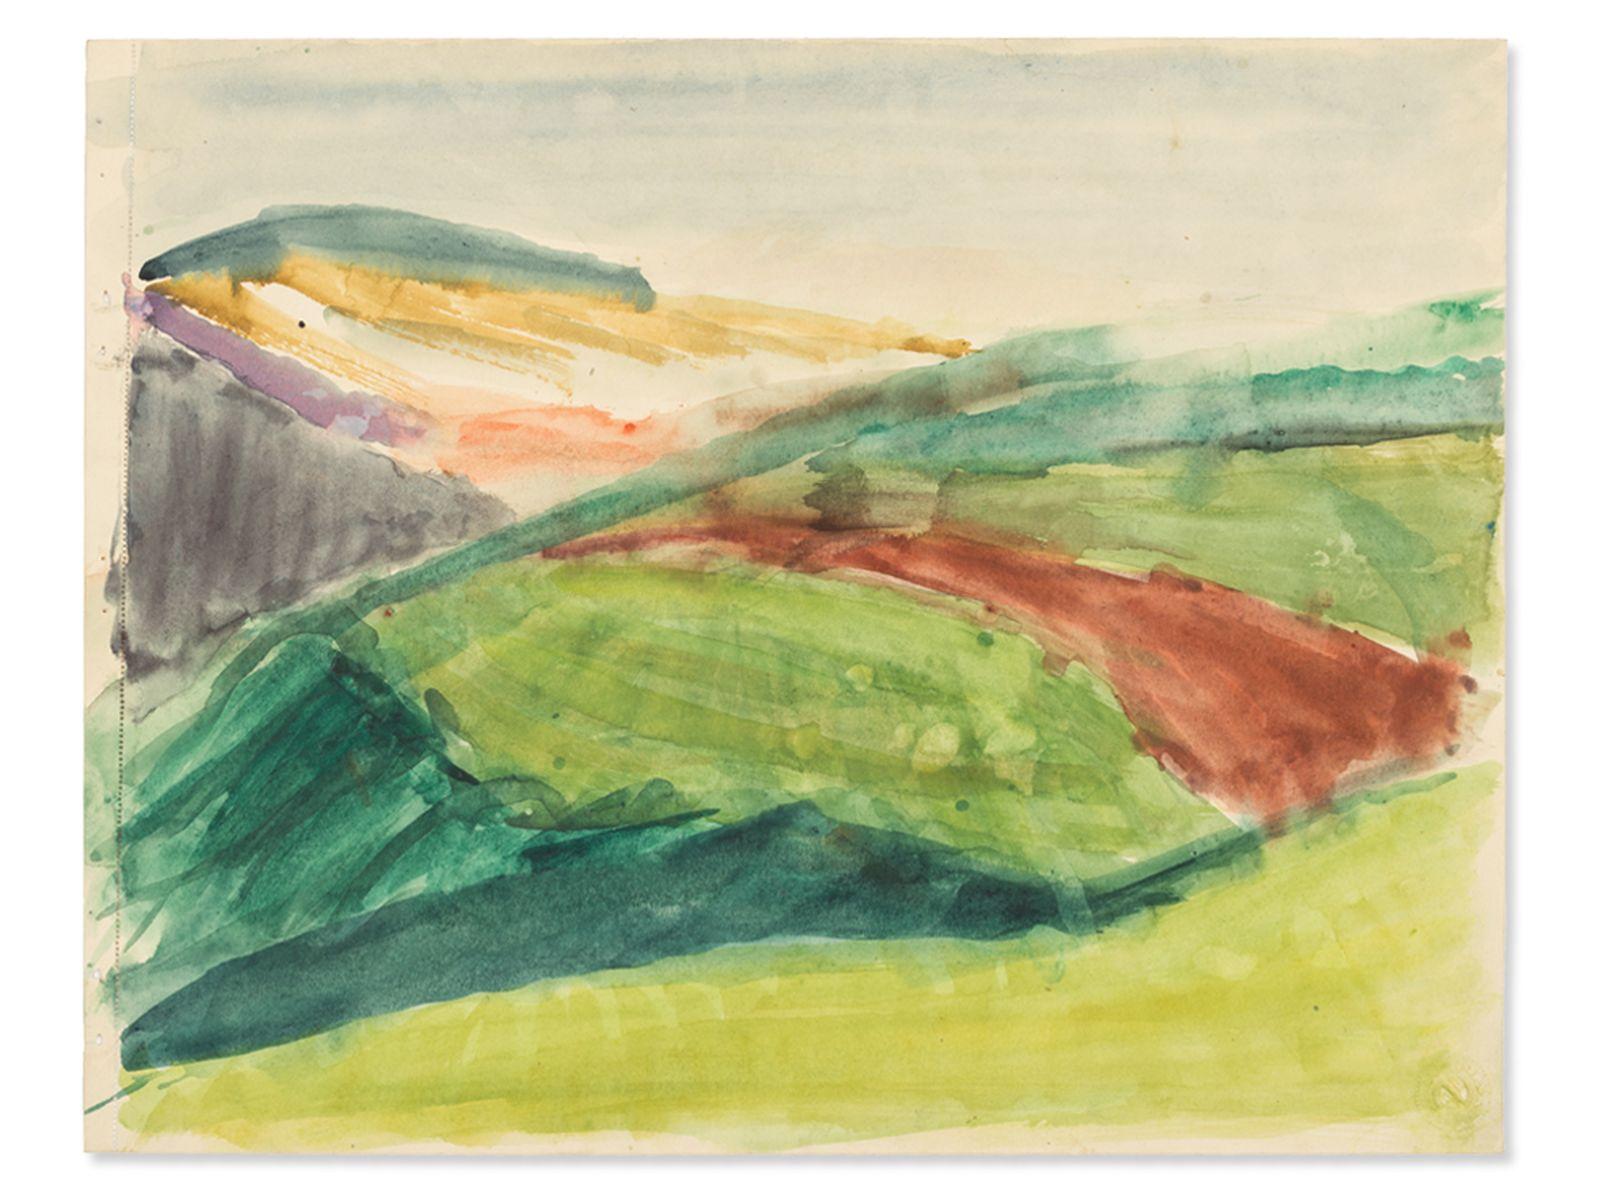 "#139 Rudolf Petrik, ""Landscape"" Austria, c. 1950 | Rudolf Petrik (1922-1991), ""Landschaft"" Österreich, ca. 1950 Image"